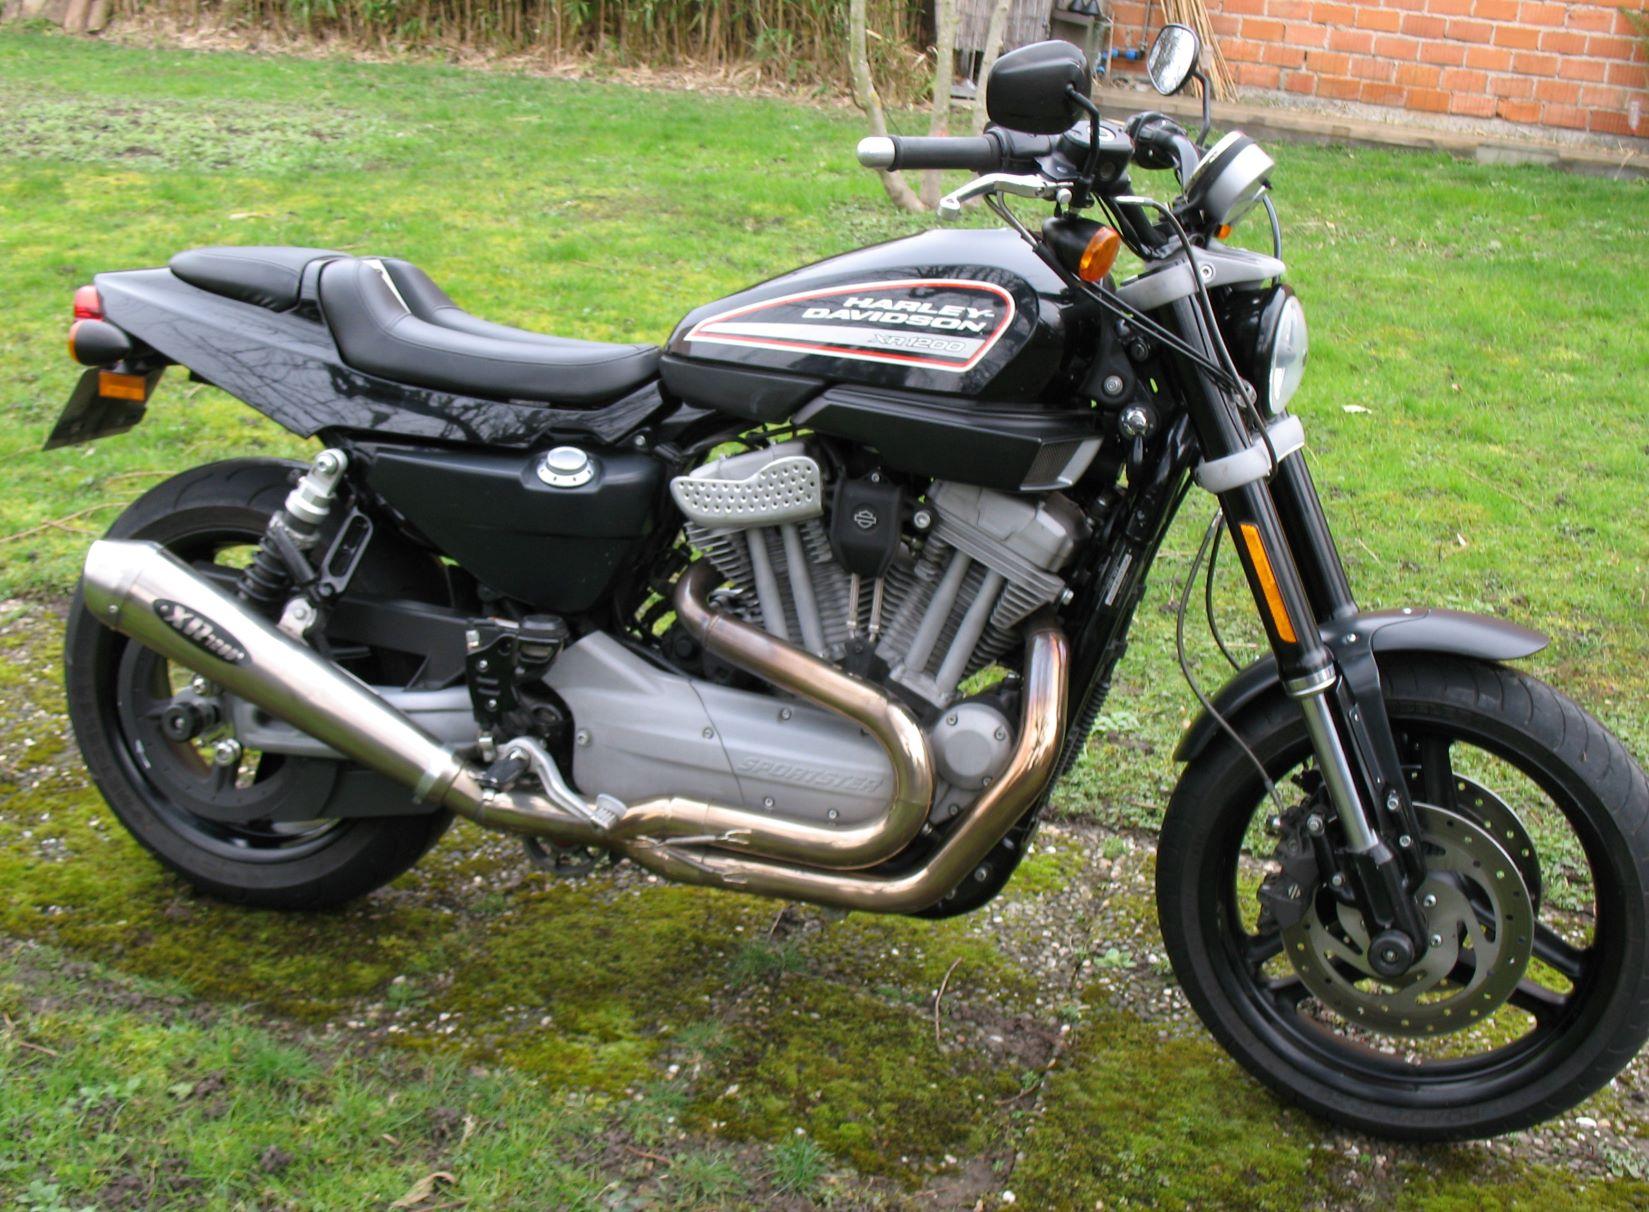 Harley Davidson 1200 XR